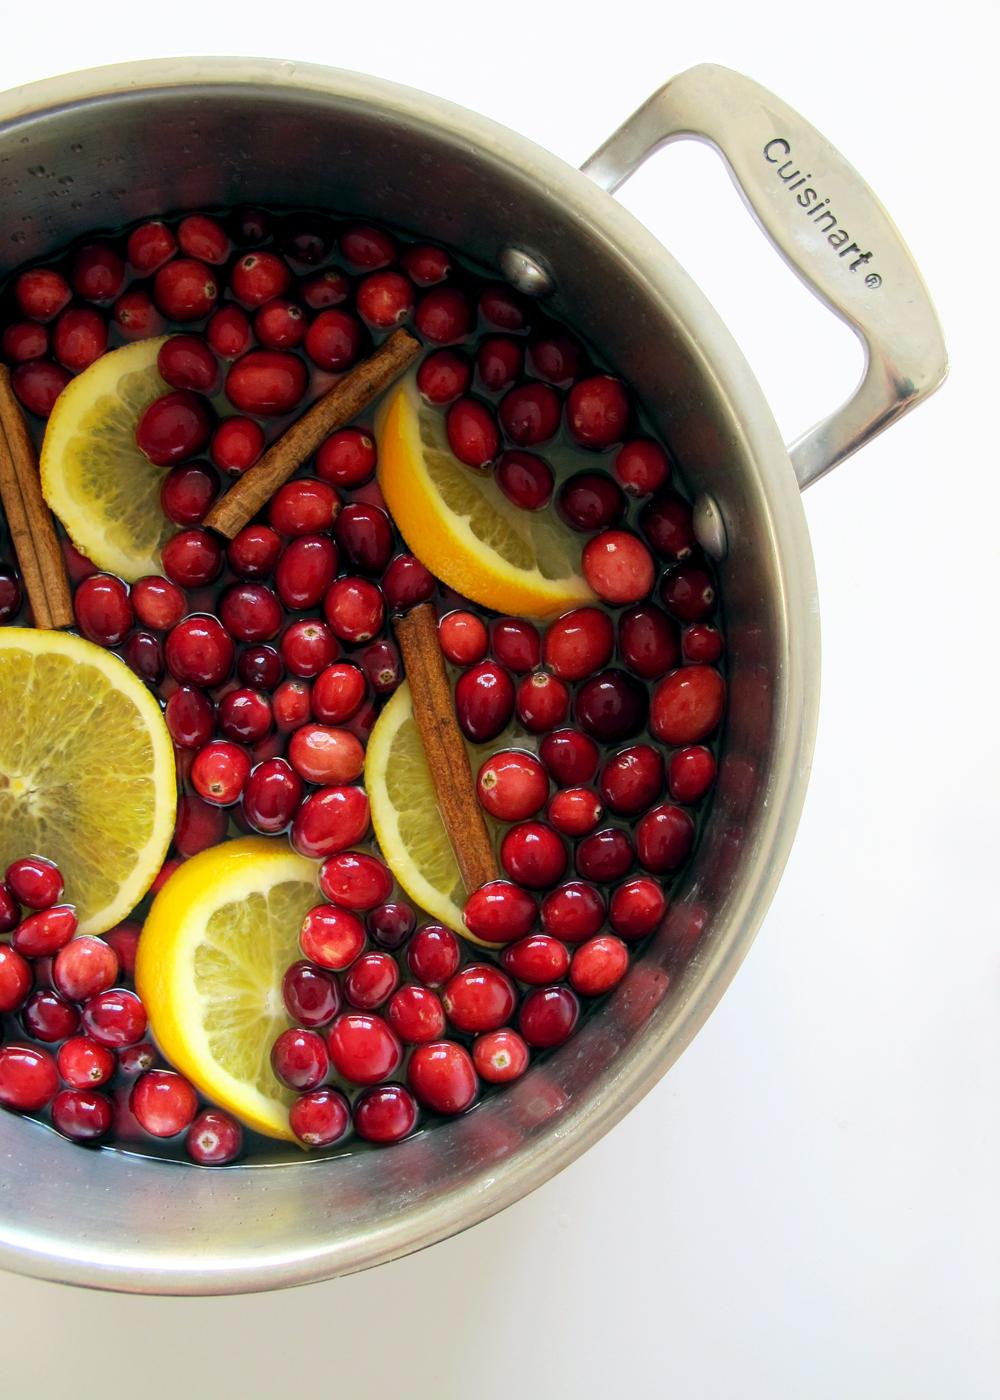 a classic cranberry and cinnamon potpourri